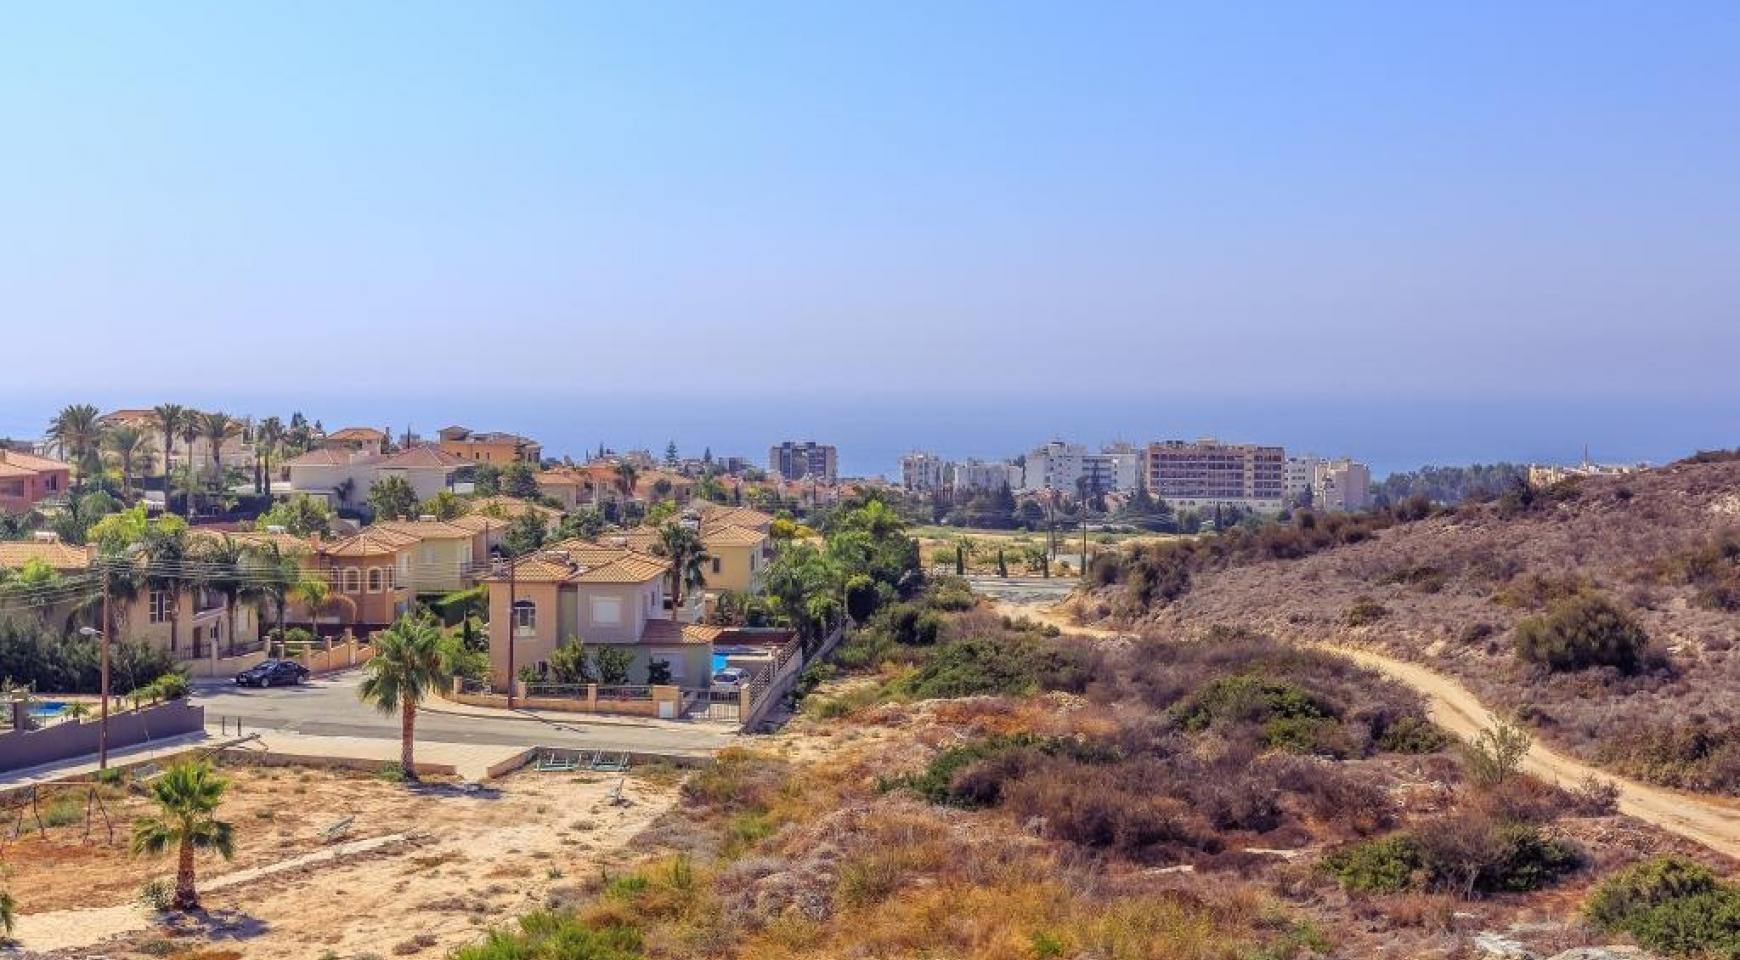 4-Спальная Вилла с Видом на Море в Районе Agios Tychonas - 13